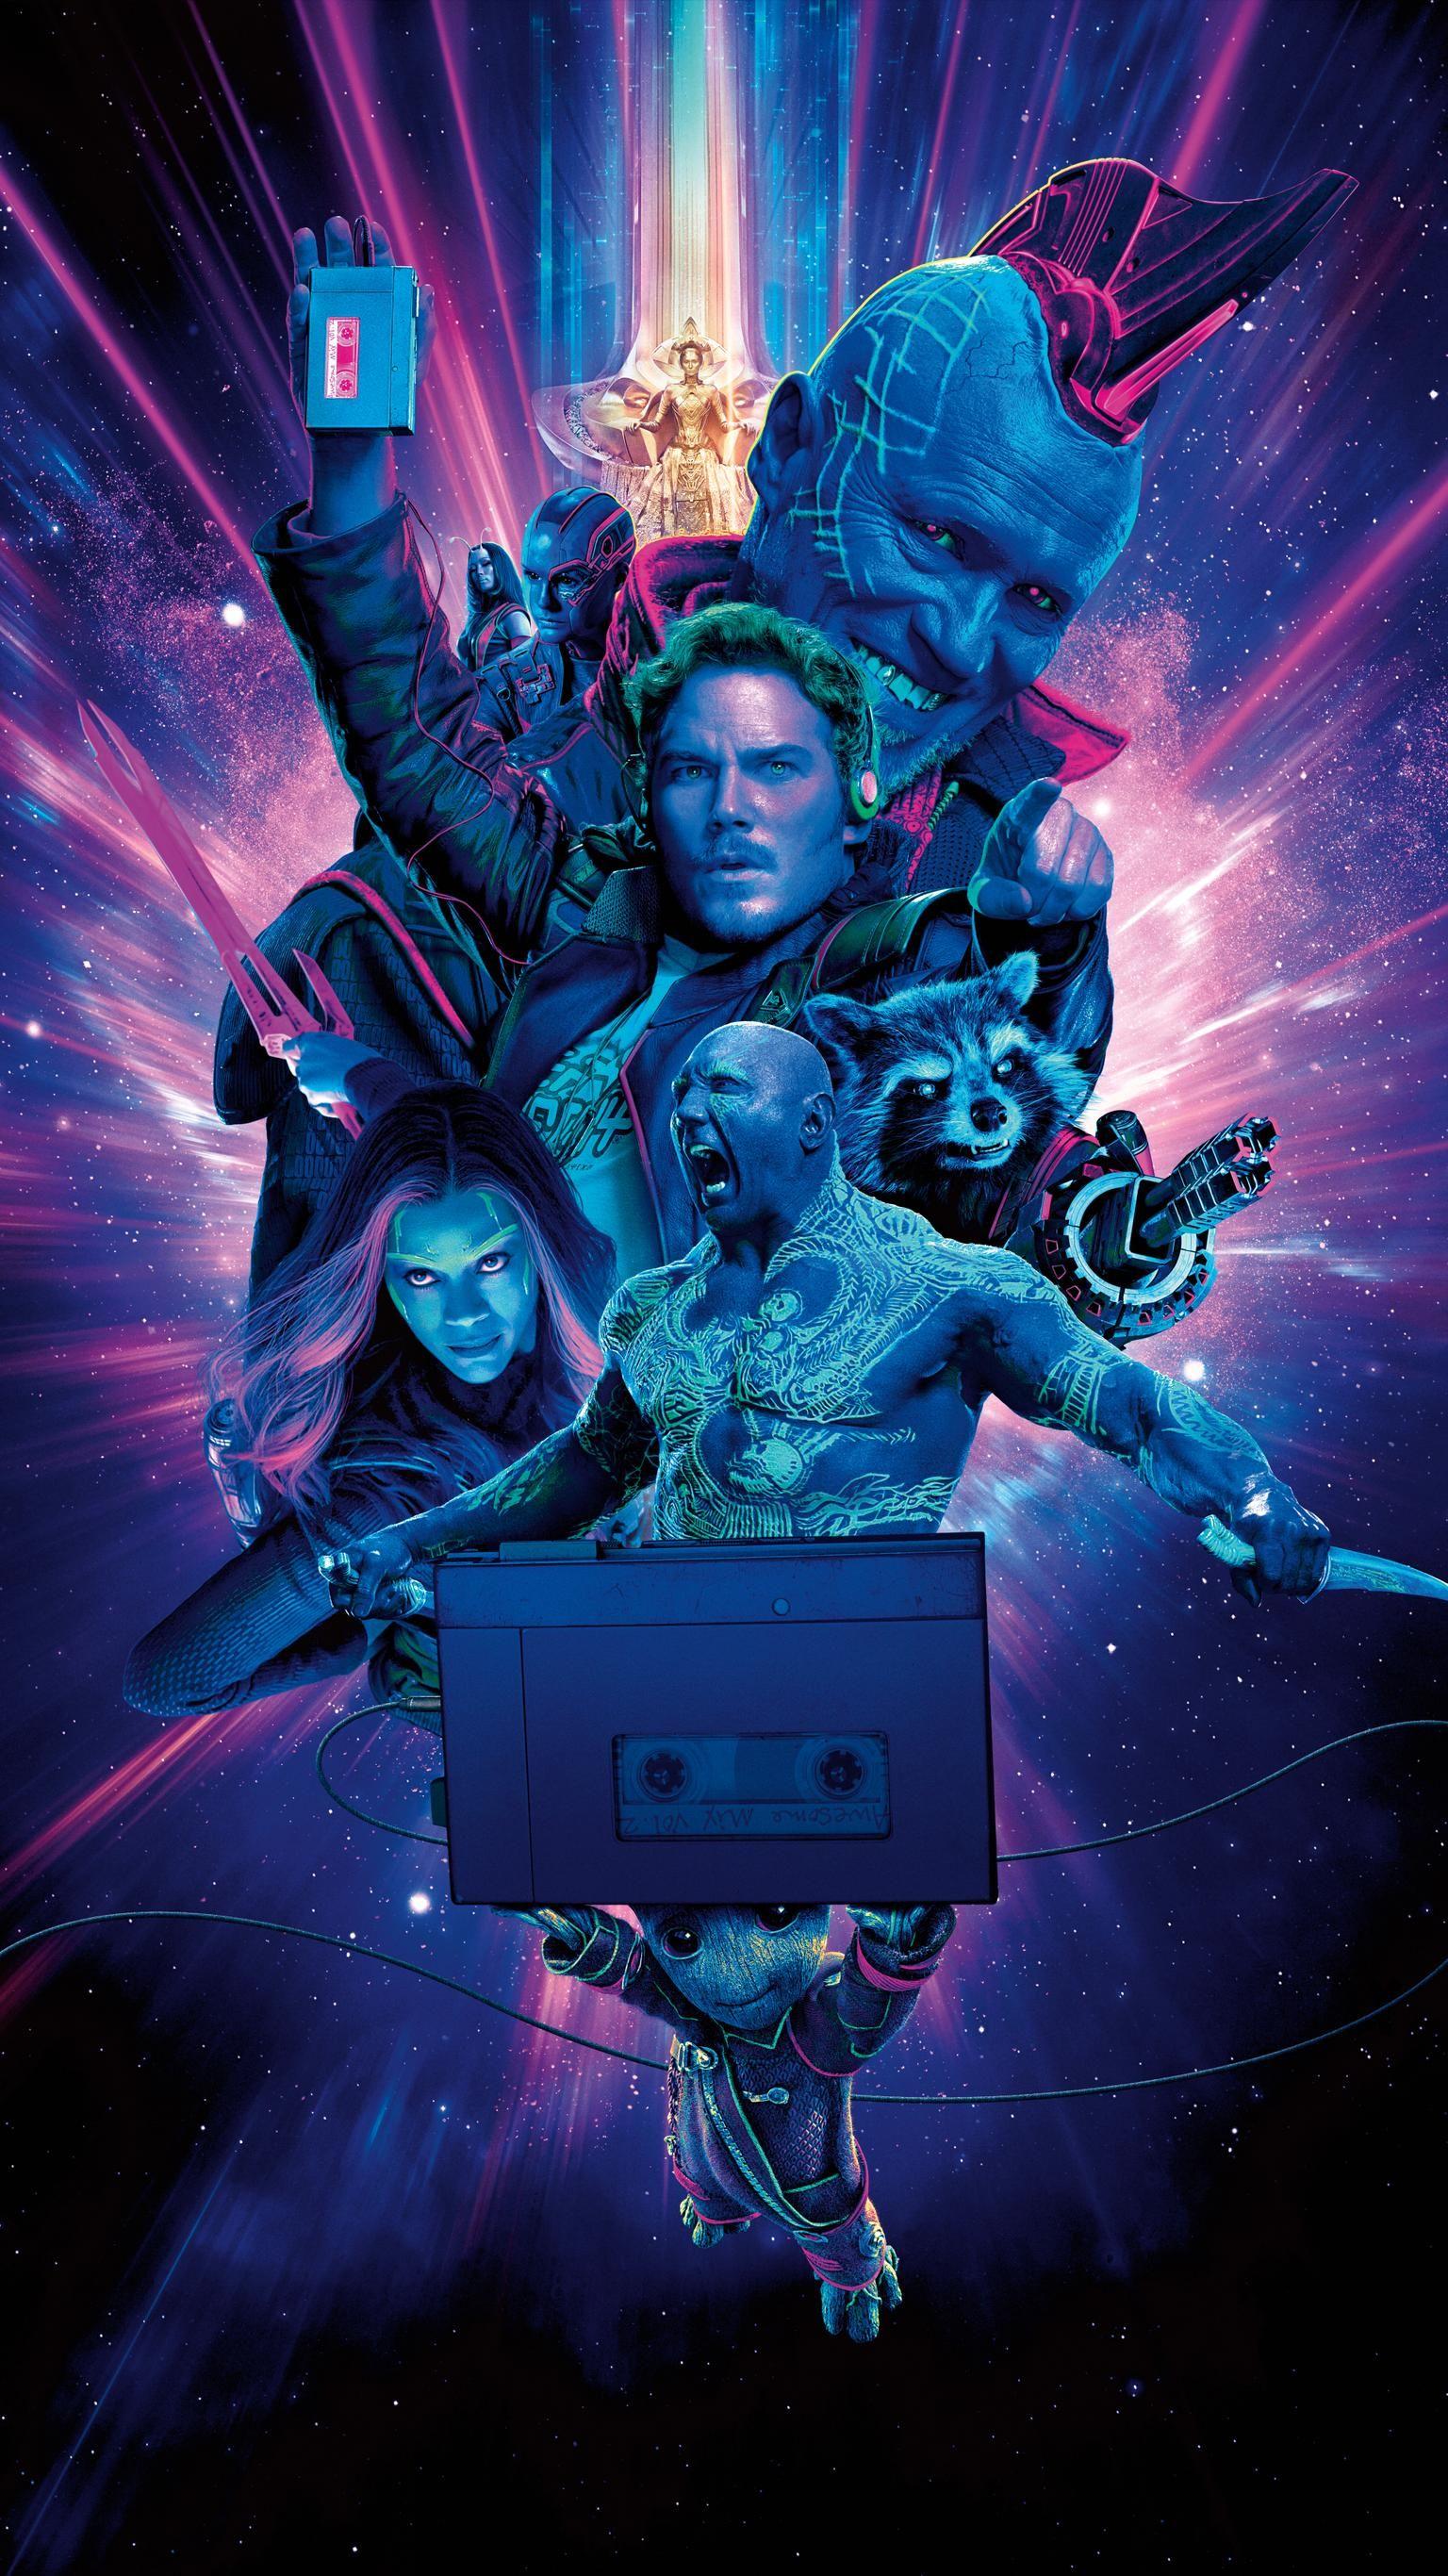 Guardians Of The Galaxy Vol 2 2017 Phone Wallpaper Moviemania Guardians Of The Galaxy Vol 2 Gaurdians Of The Galaxy Guardians Of The Galaxy